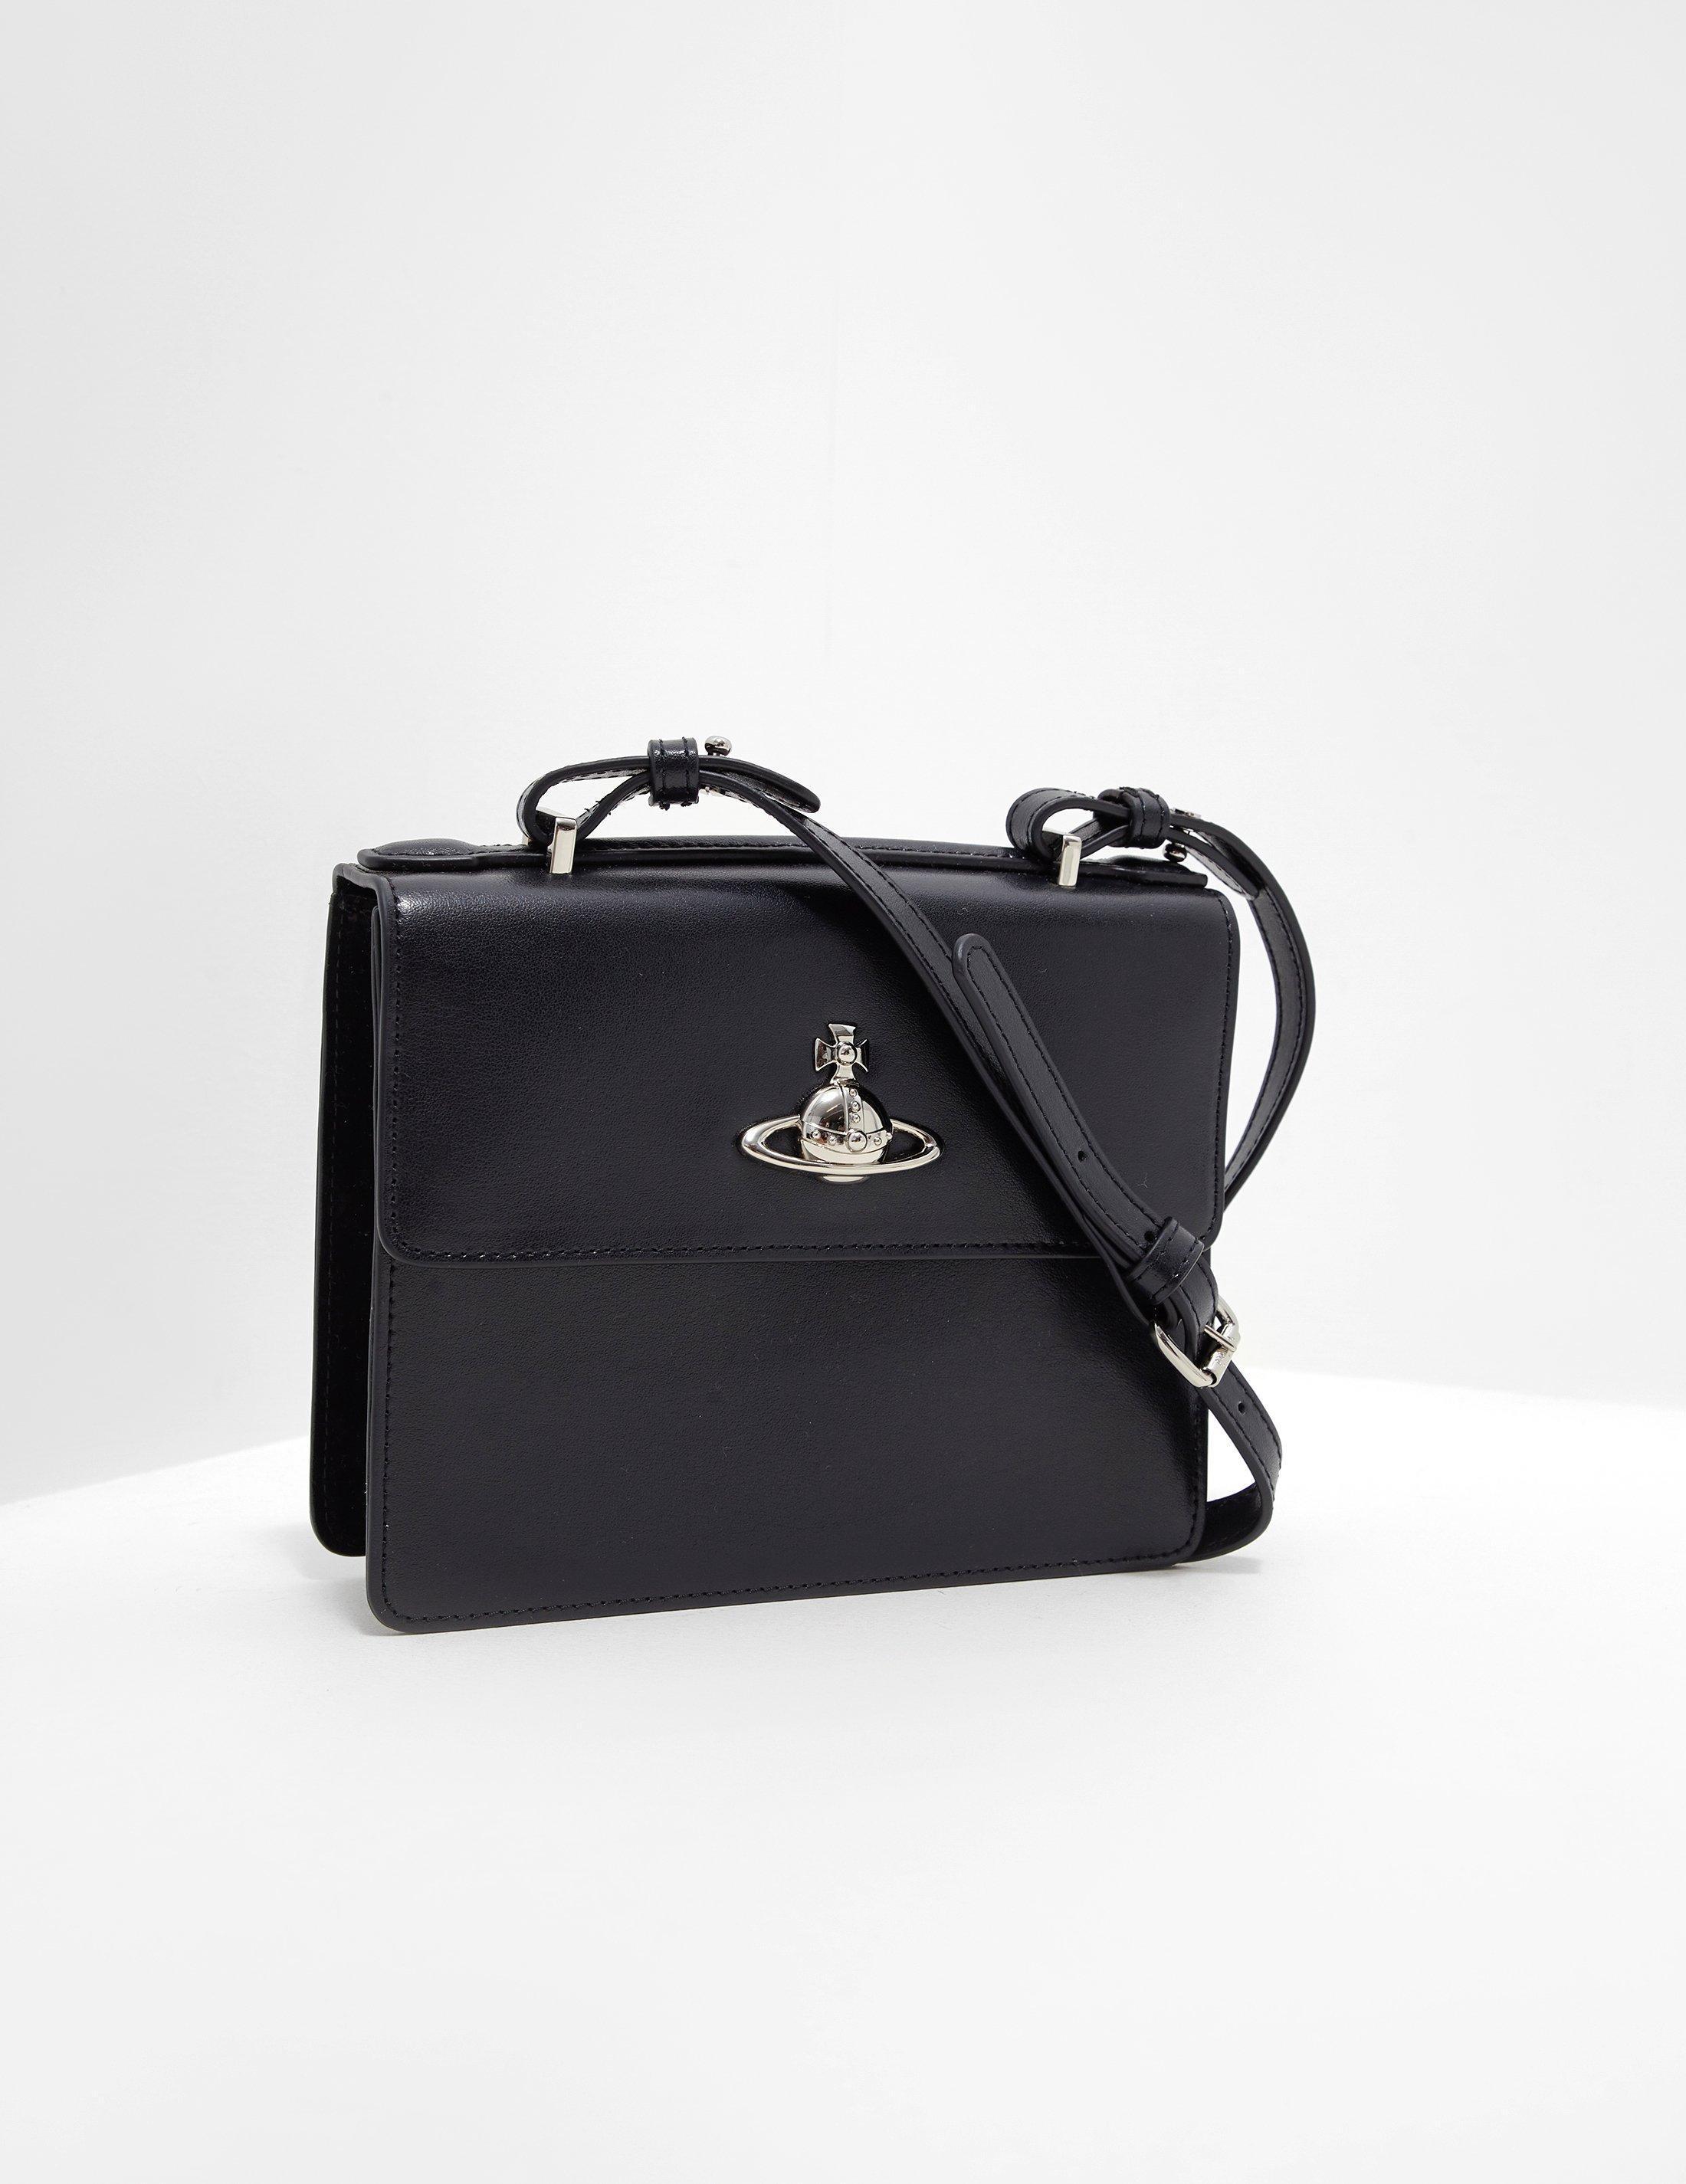 Vivienne Westwood Matilda Shoulder Bag Black in Black - Lyst eb8c42503a3a5